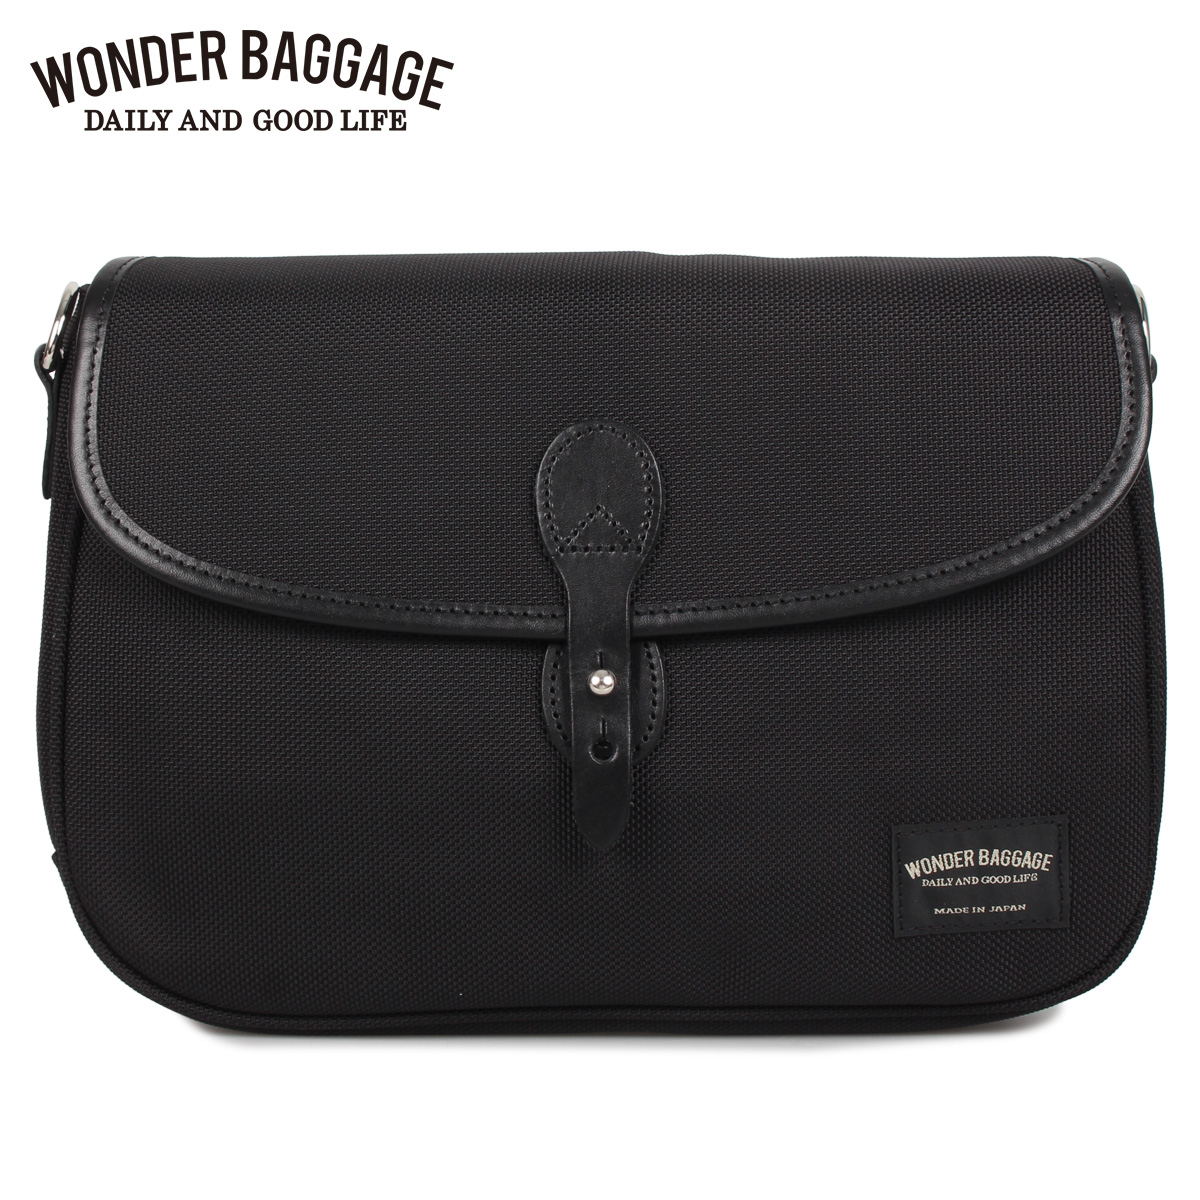 WONDER BAGGAGE ワンダーバゲージ バッグ ショルダーバッグ メンズ レディース 4L GOODMANS FLAP SHOULDER ブラック 黒 [4/6 新入荷]